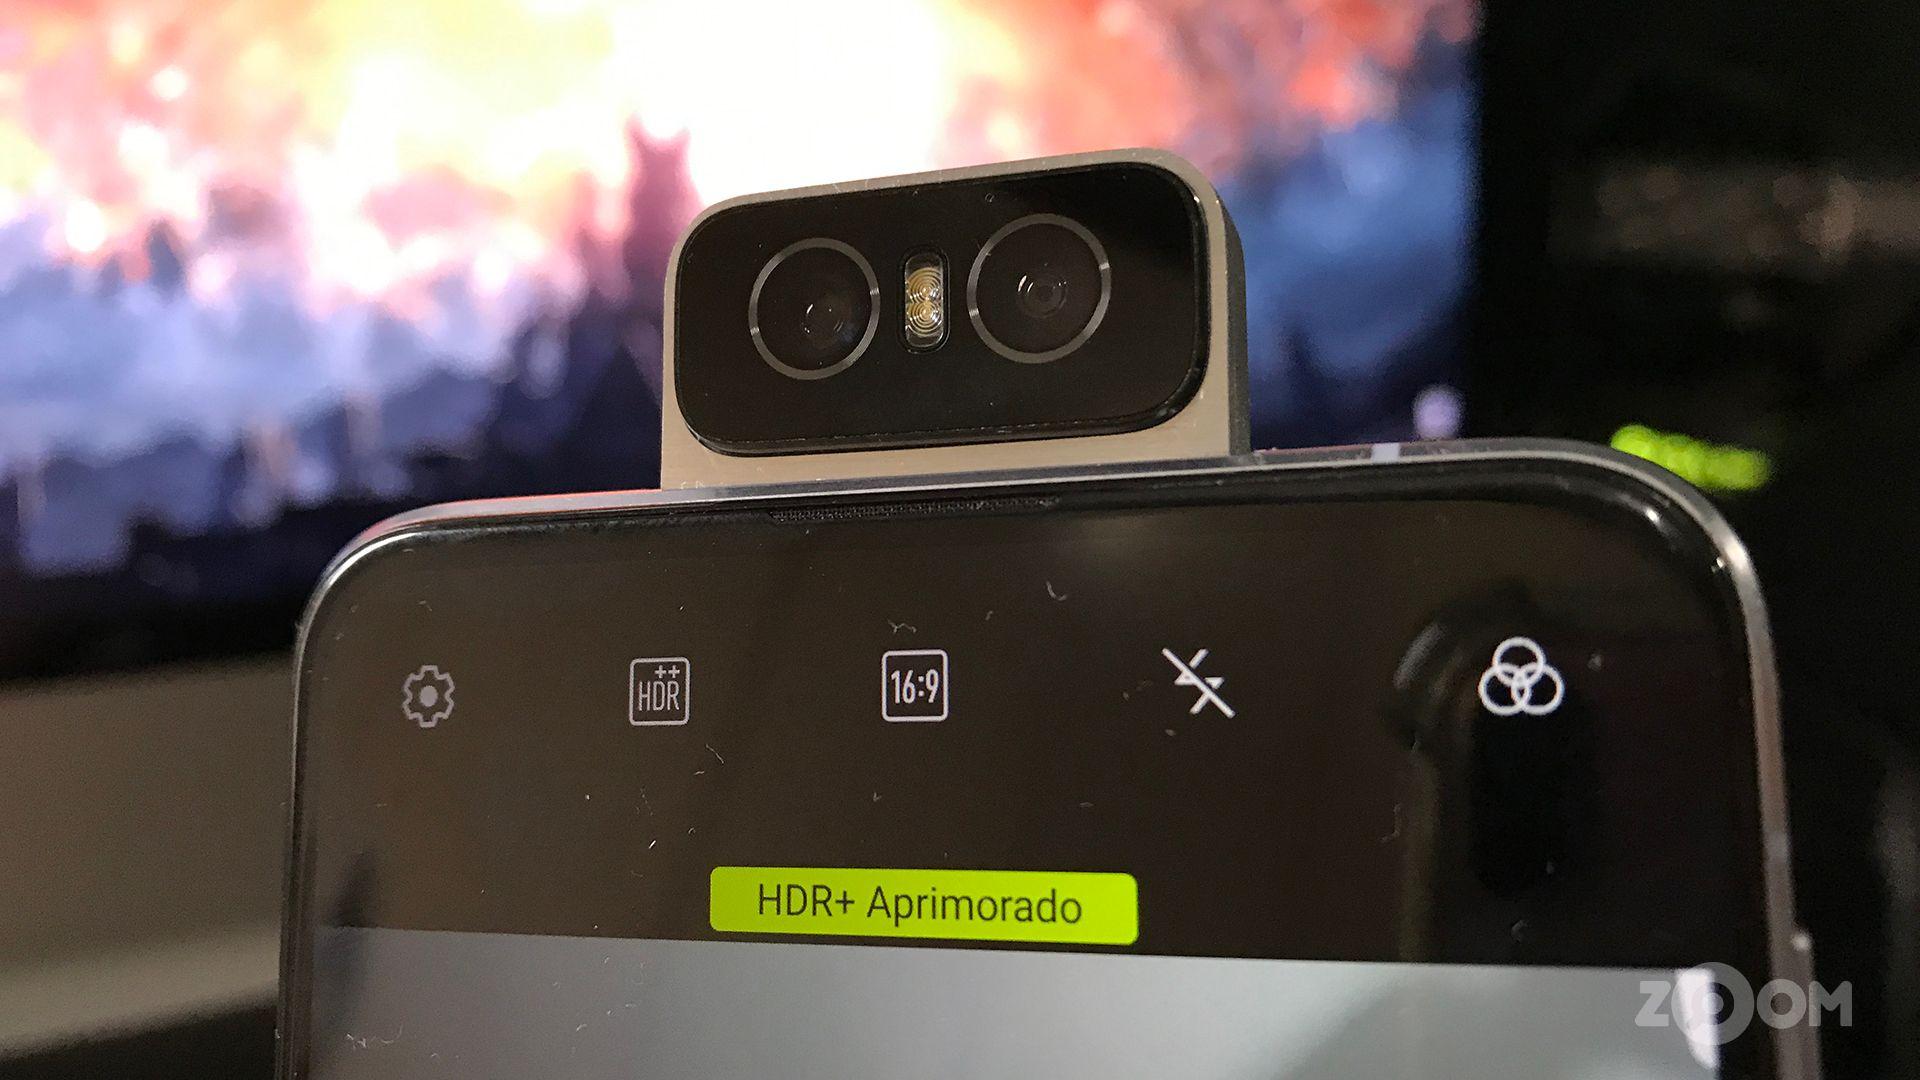 O diferencial do Zenfone 6 é a Flip Camera. (Foto: Murilo Tunholi/Zoom)